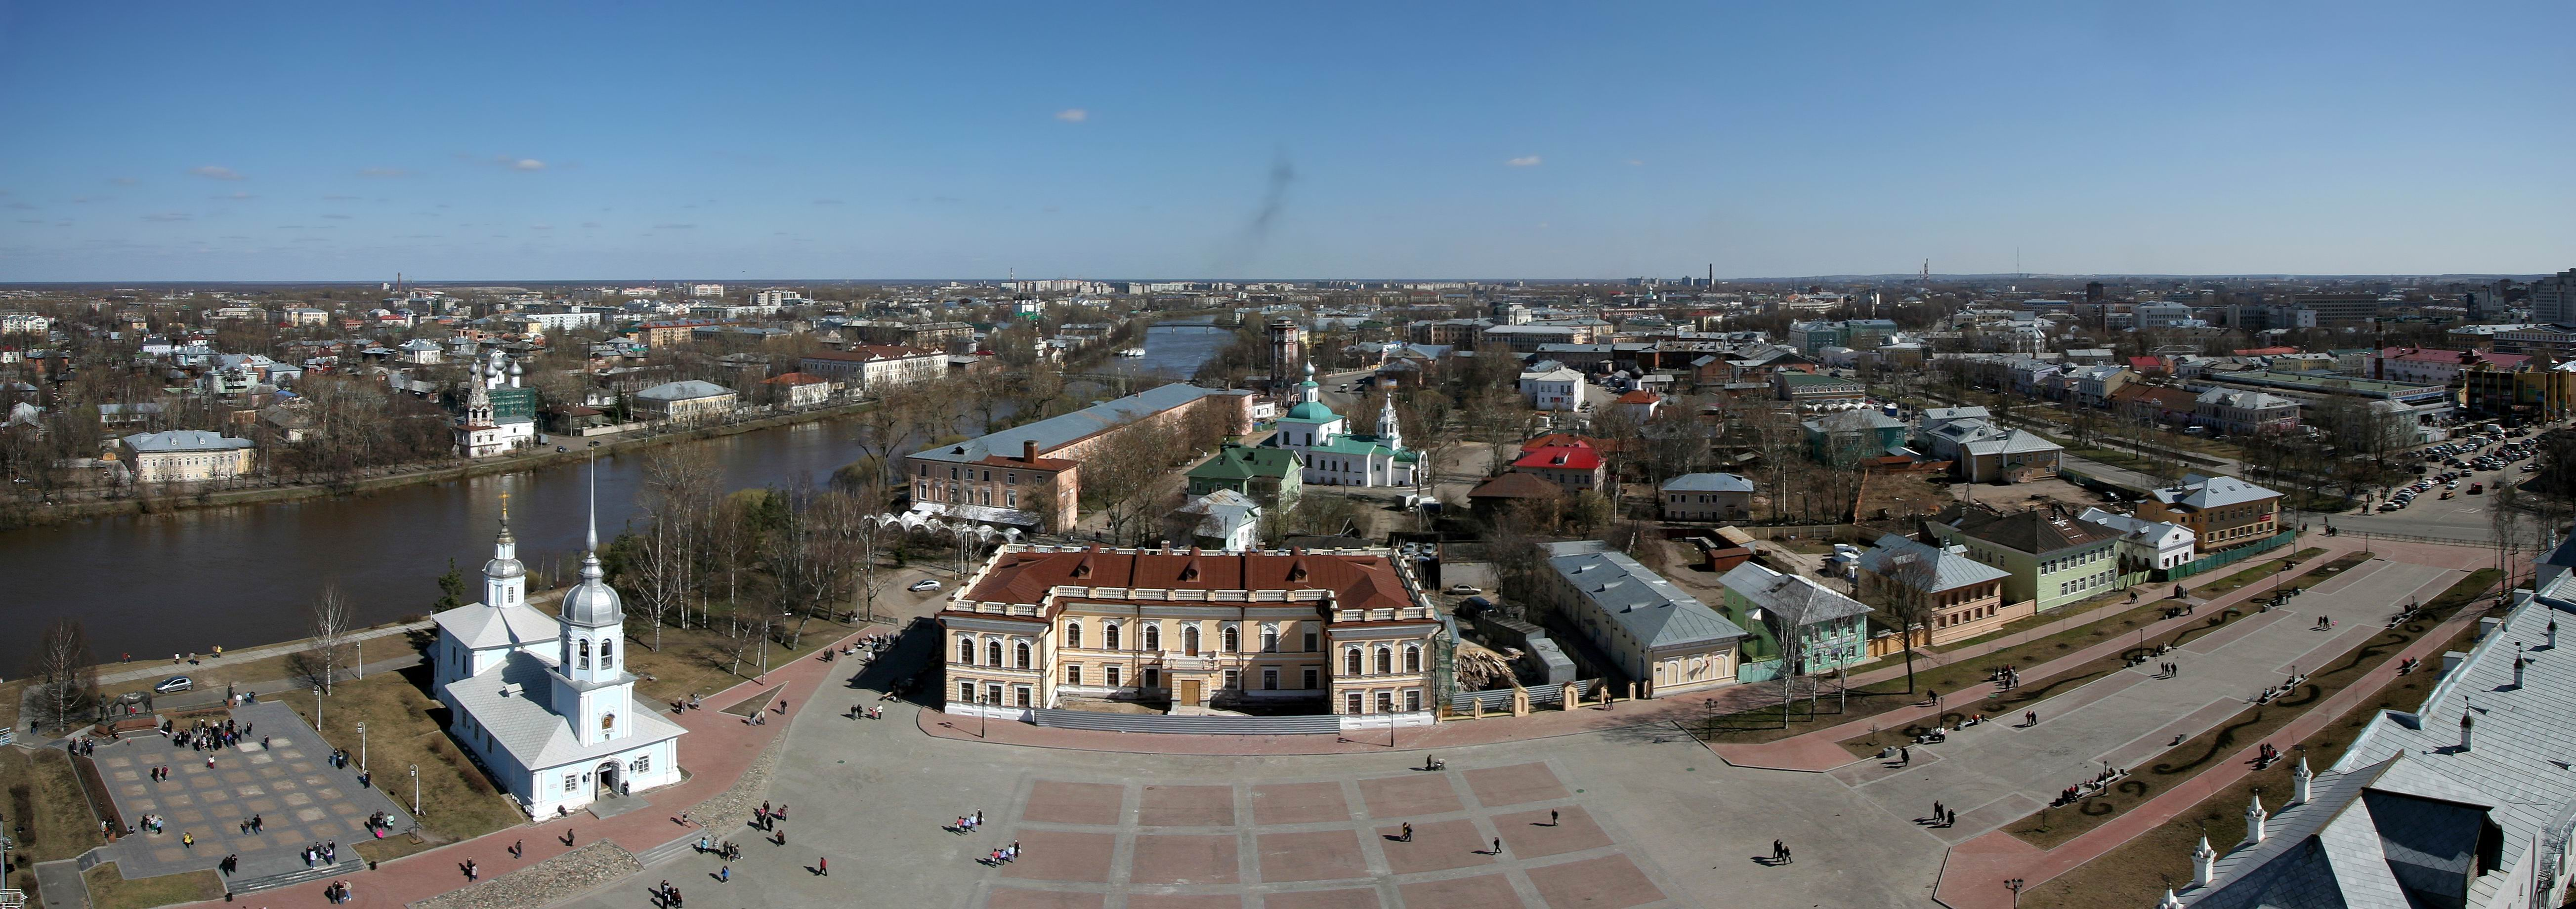 Вид на Вологду с колокольни